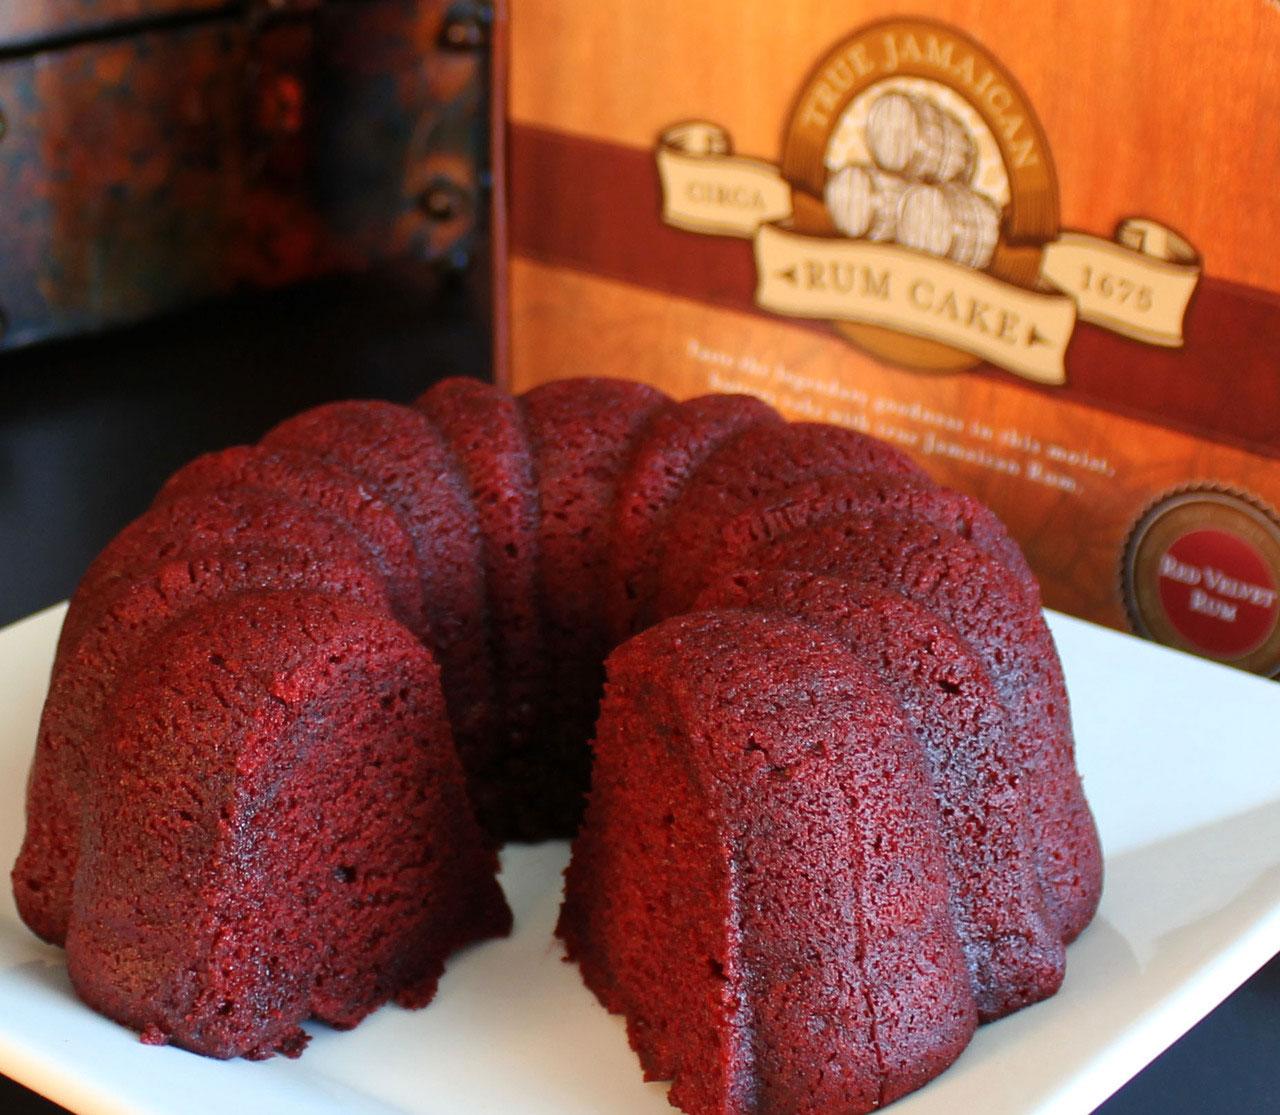 Gifts Wicked Jack's Red Velvet Cake